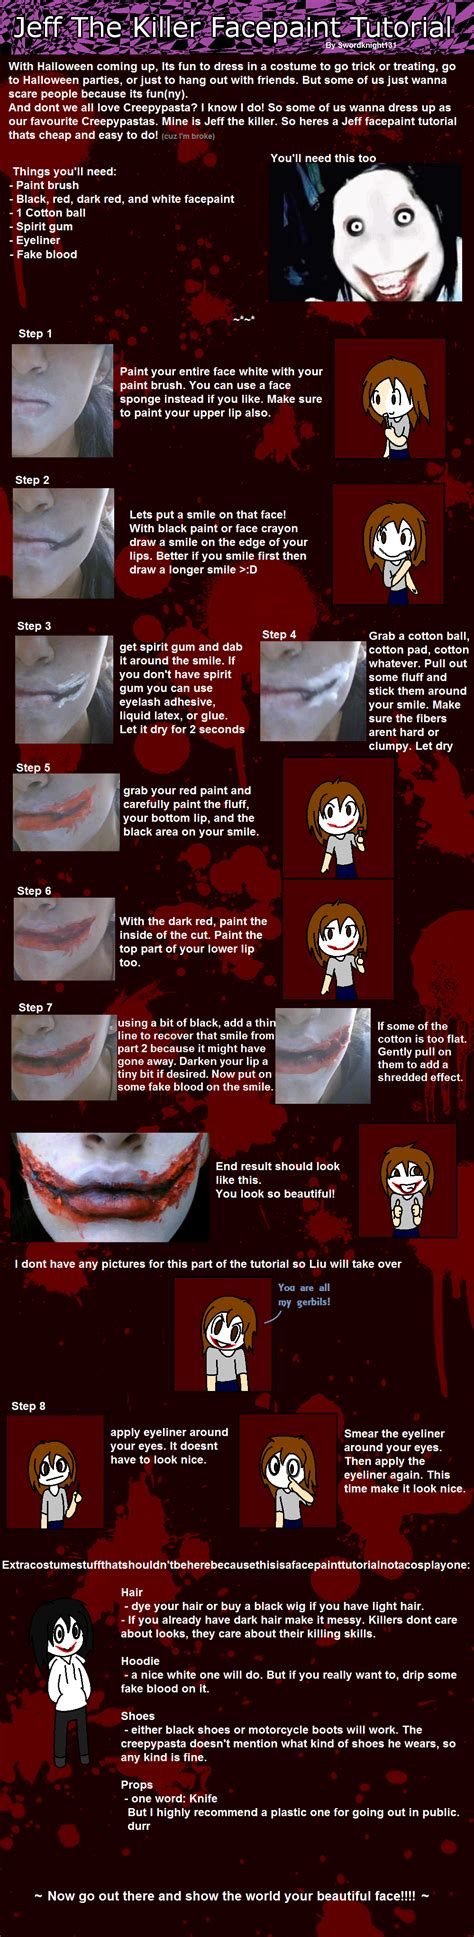 jeff the killer makeup tutorial epic jeff the killer facepaint tutorial by swordknight131